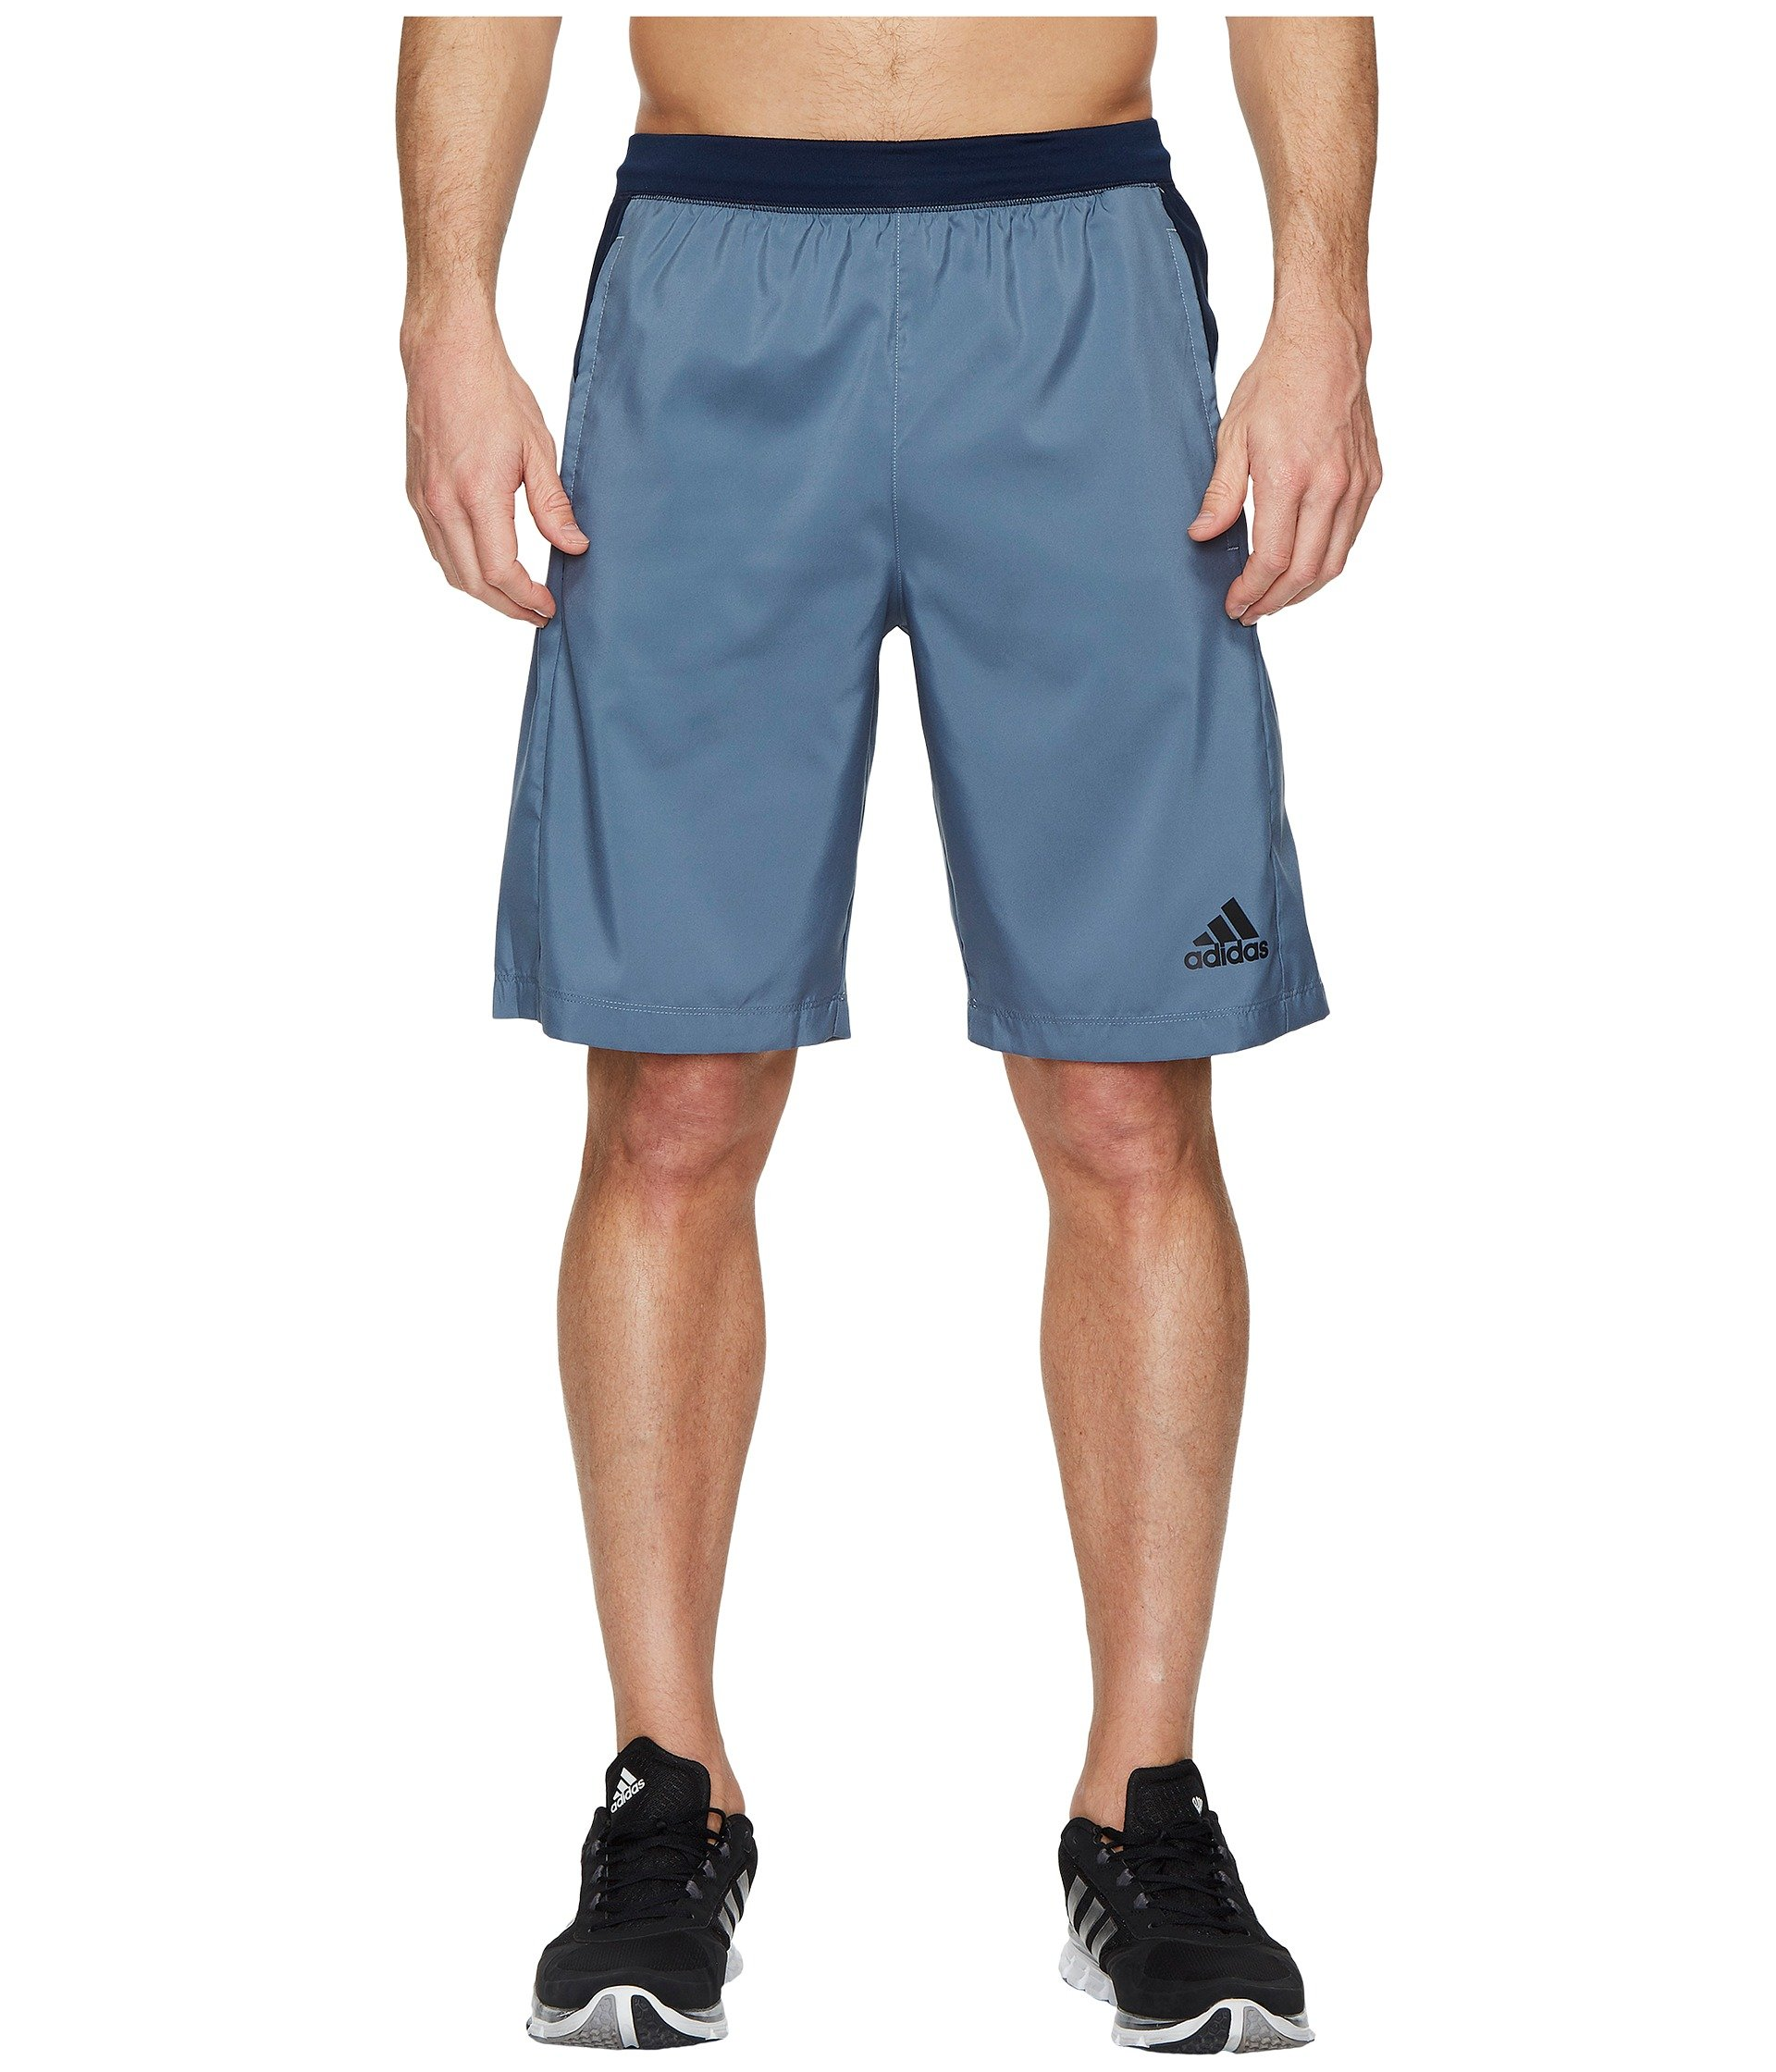 adidas Men's Designed-2-Move Shorts, Raw Steel, Small